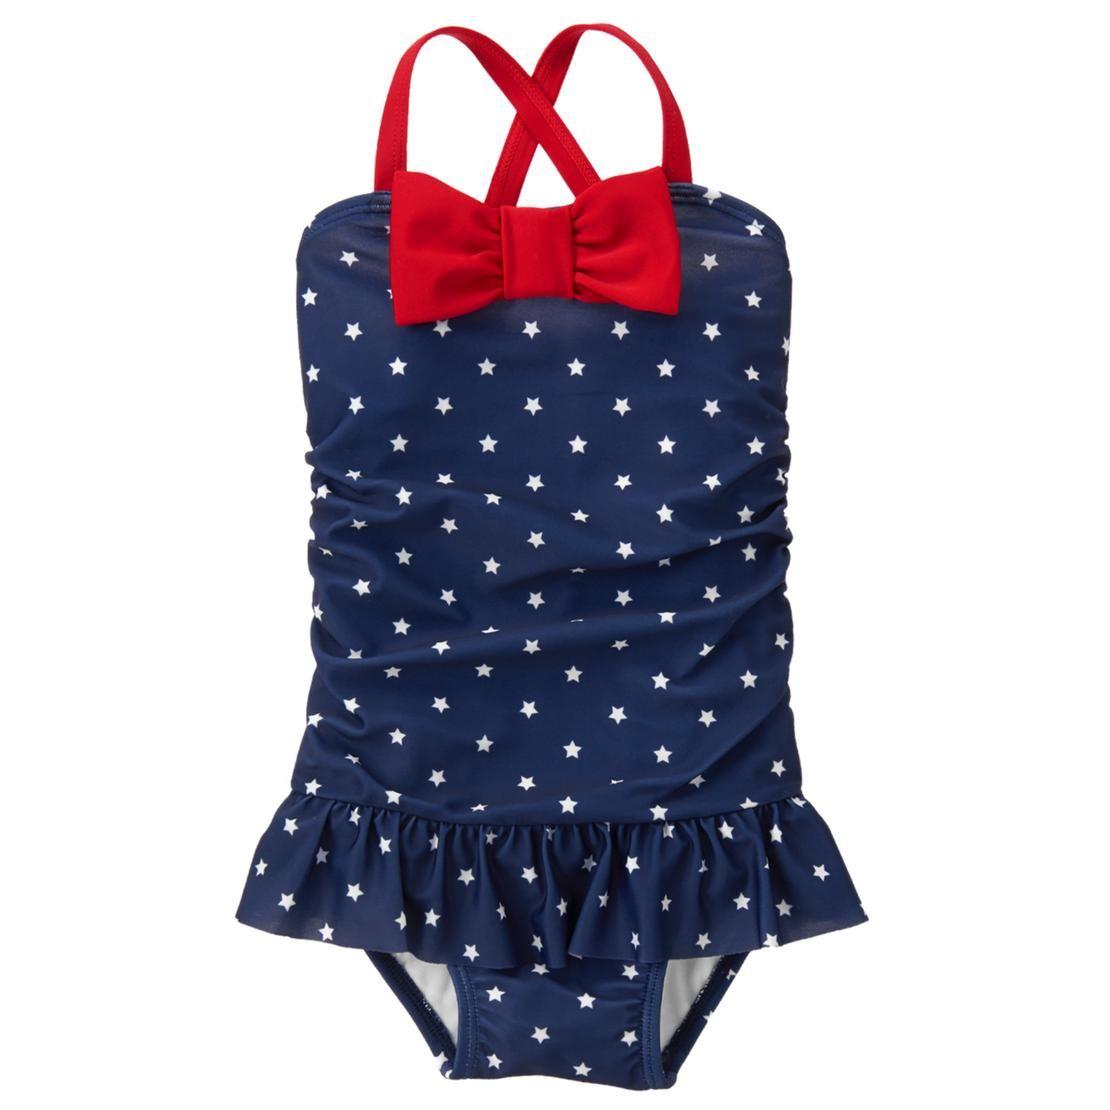 Gymboree Girls Swim 1-Piece Peacock Swimsuit 2T UPF 50+